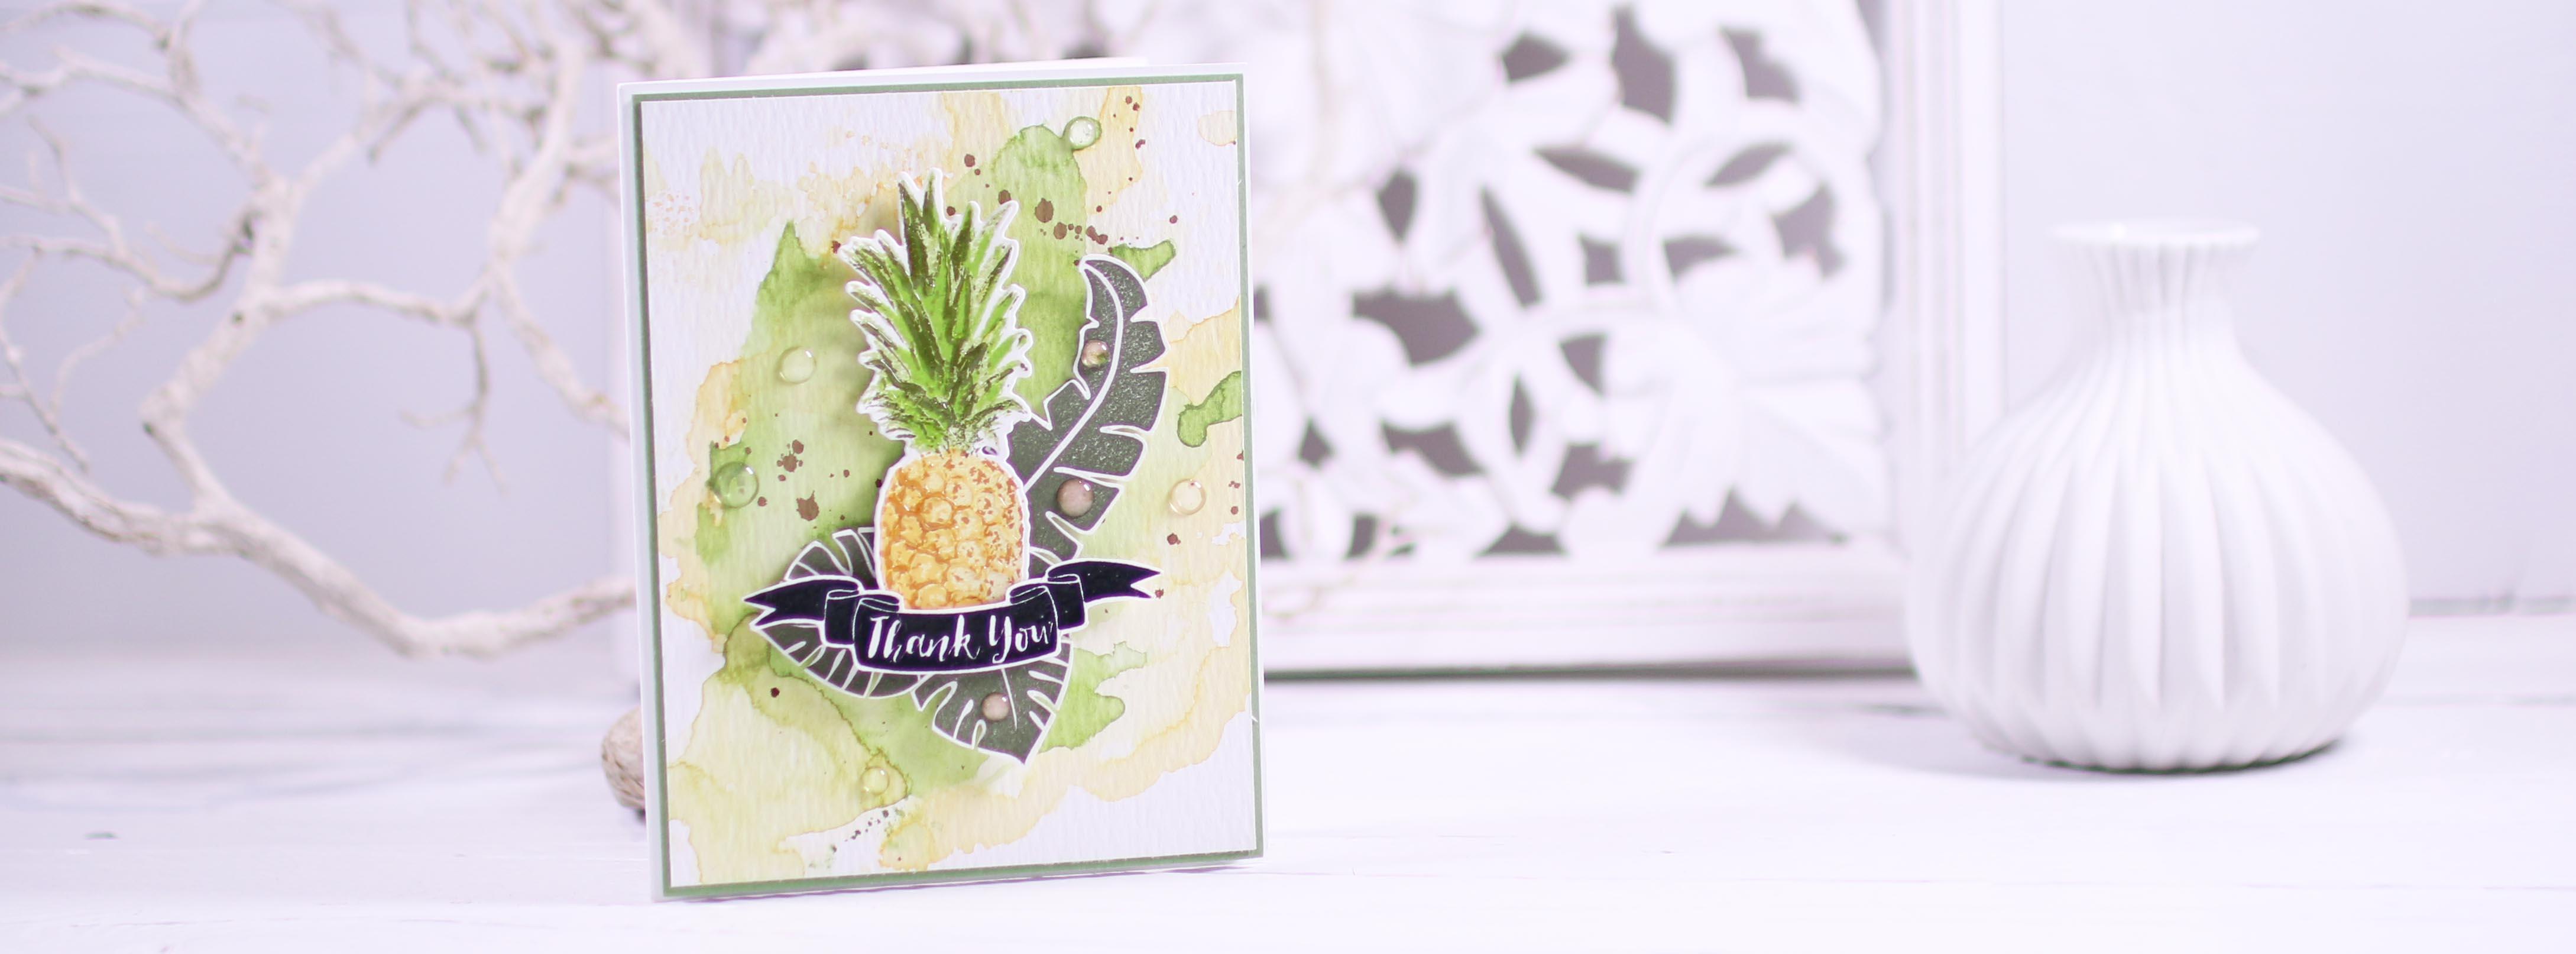 Dankeskarte mit Ananas